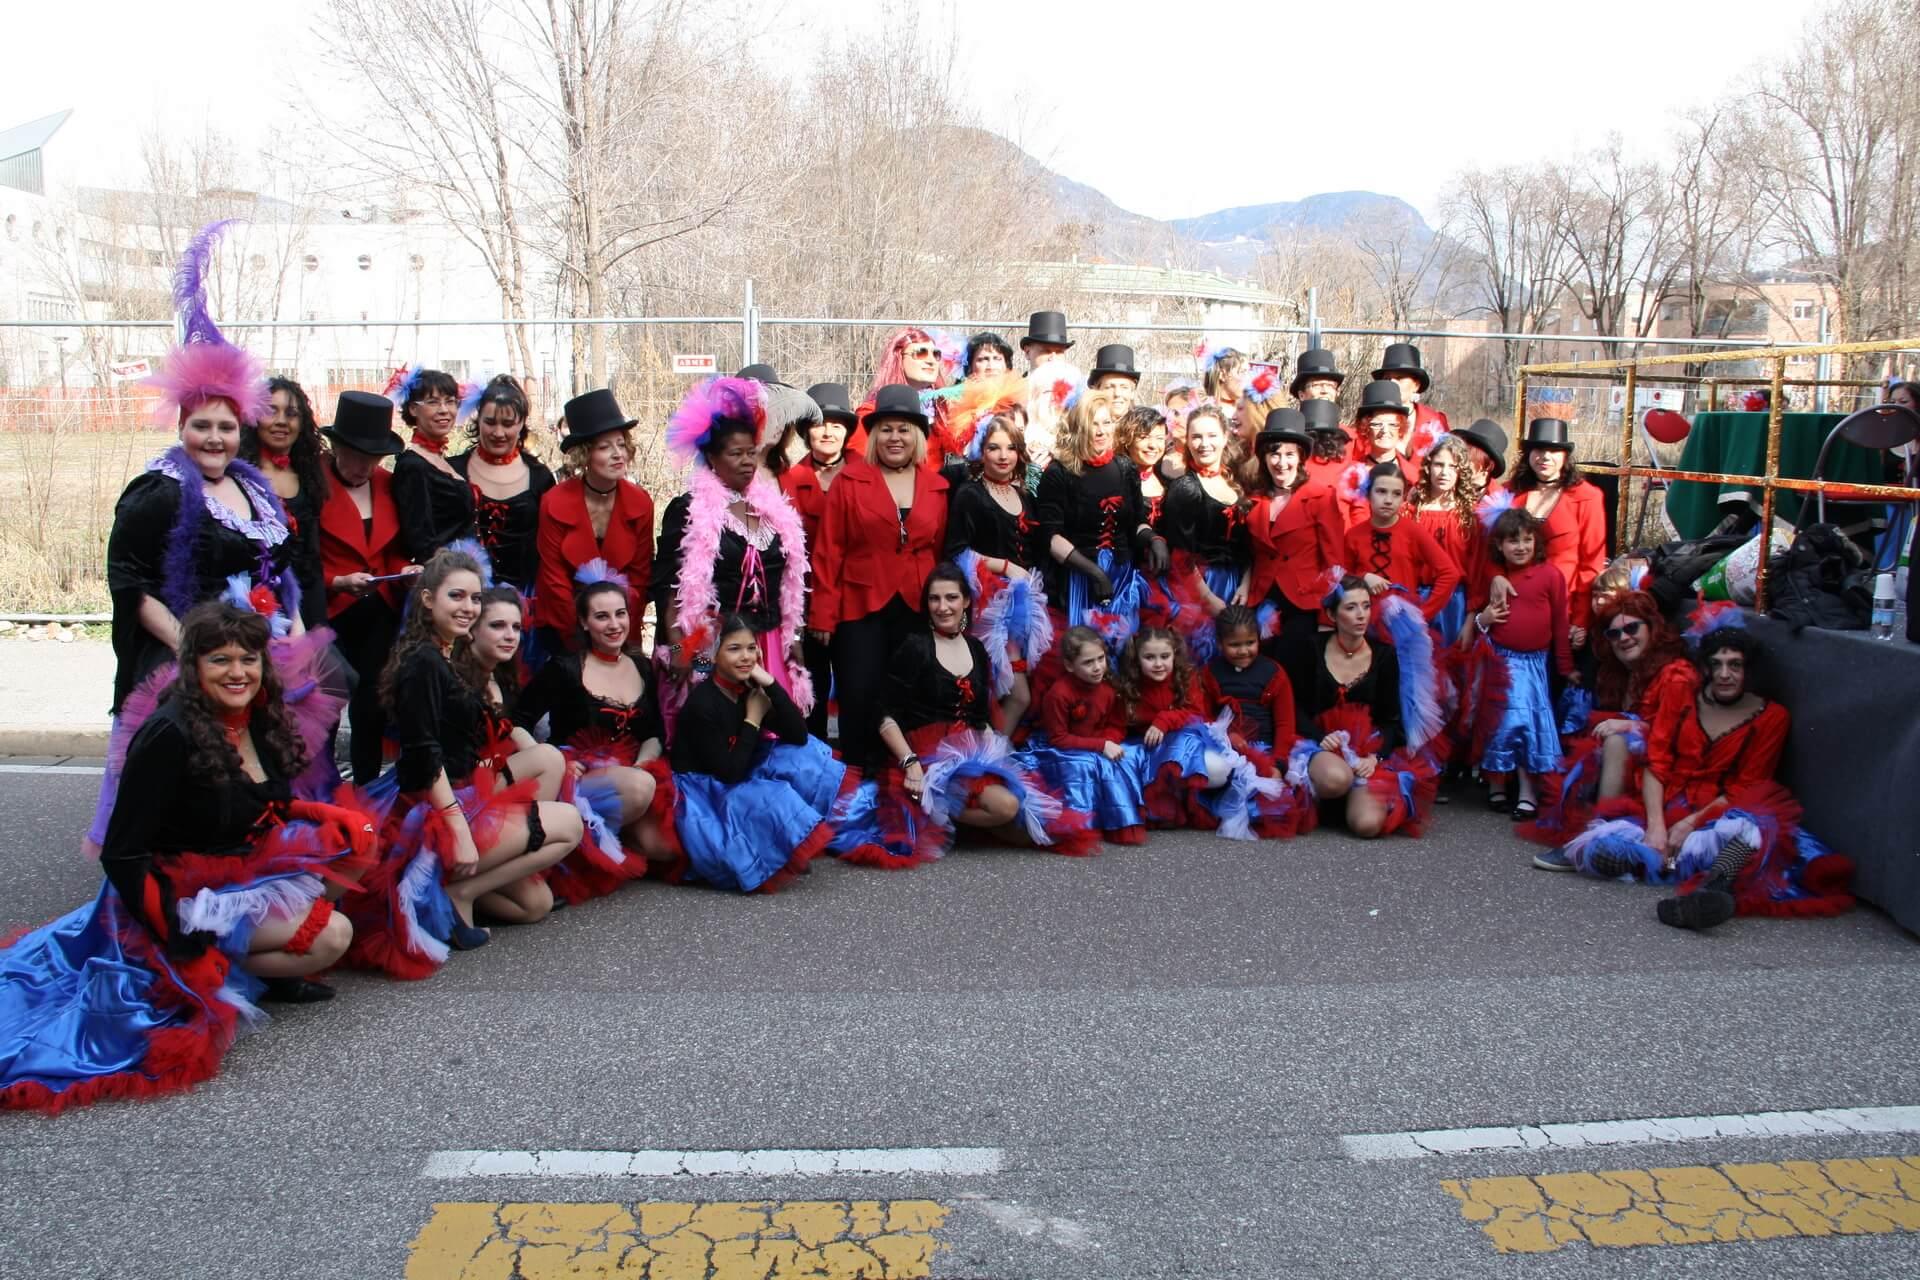 El Molin Ross 2014 Gruppo Carnevalesco